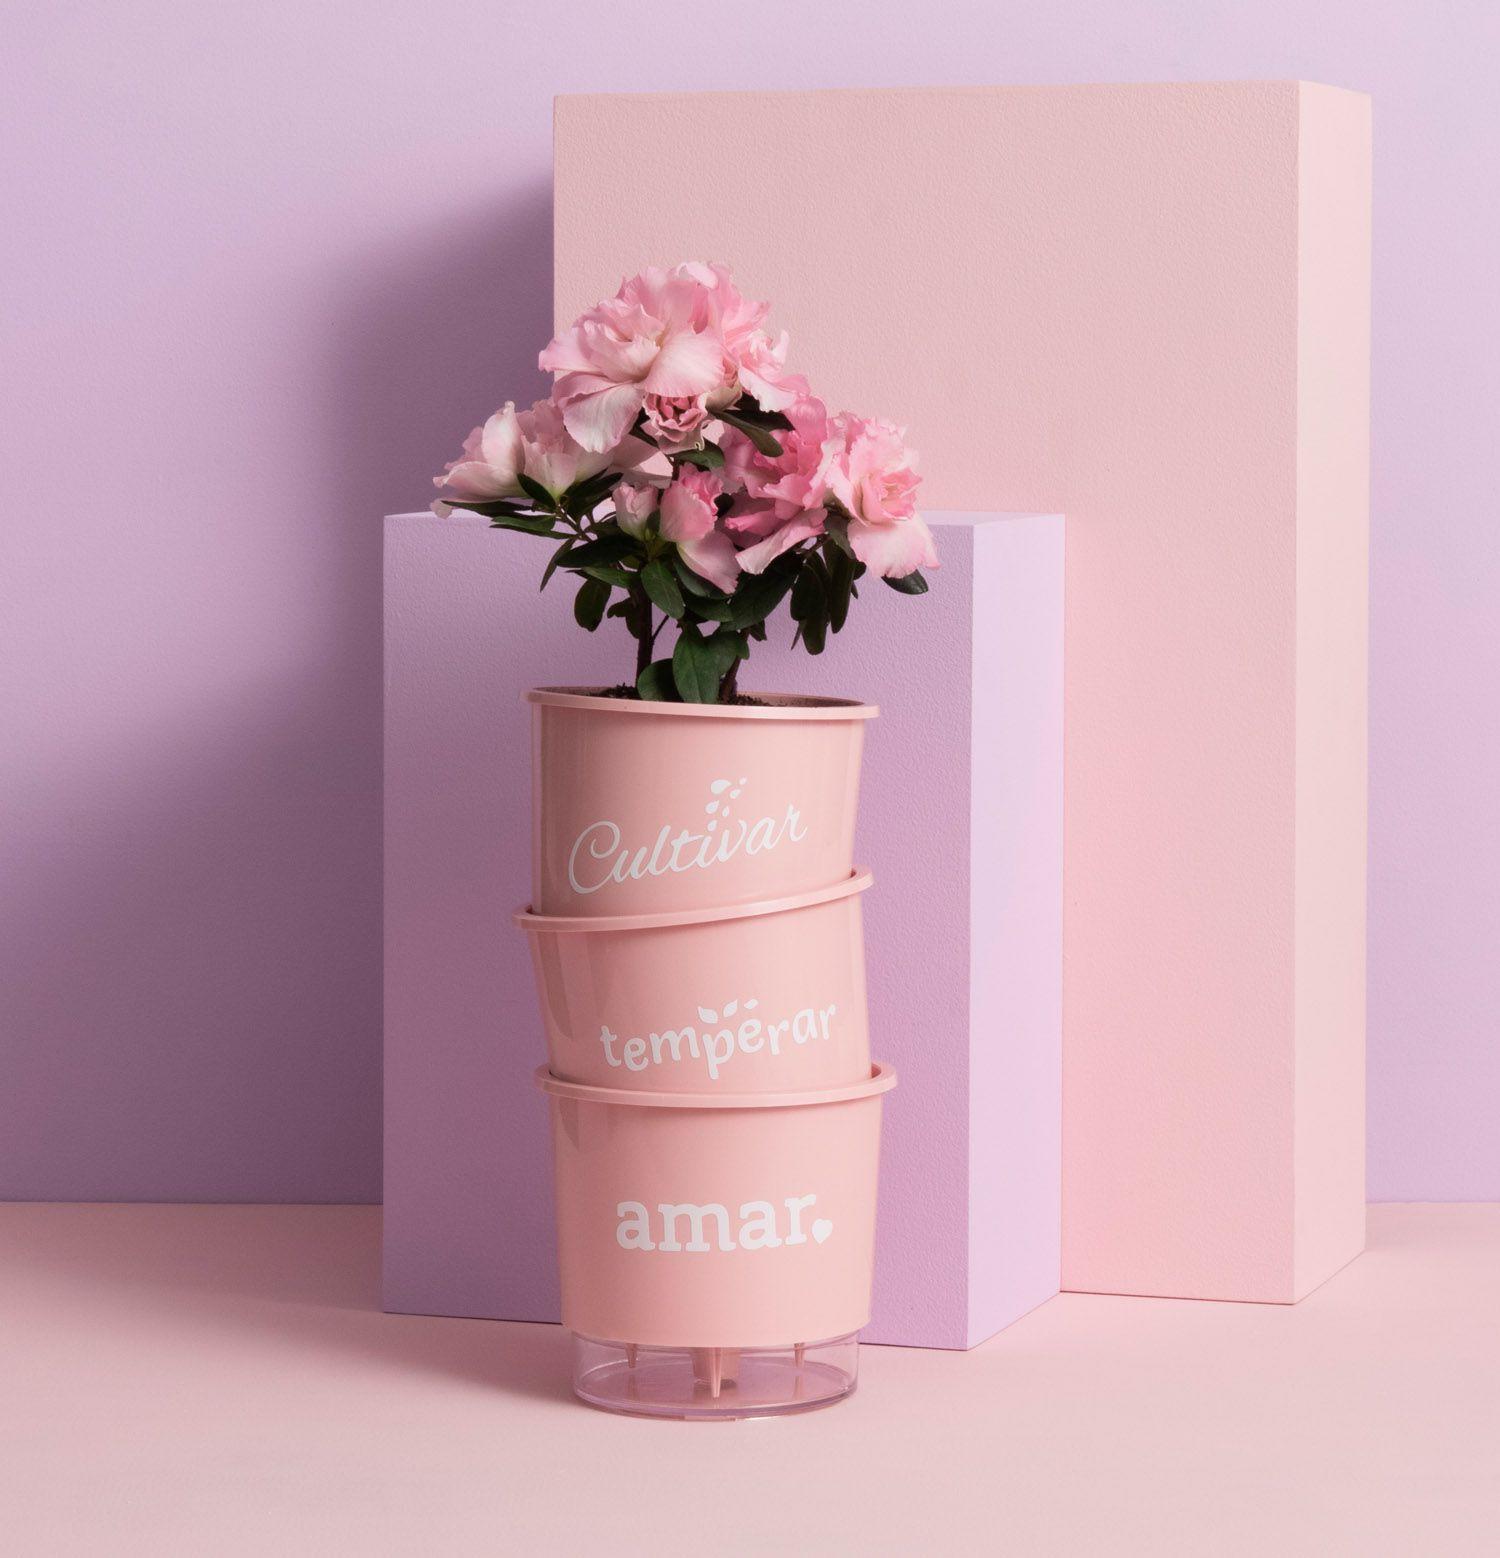 Kit 3 Vasos Autoirrigáveis Pequenos N02 12cm x 11cm Cultivar Temperar e Amar Rosa